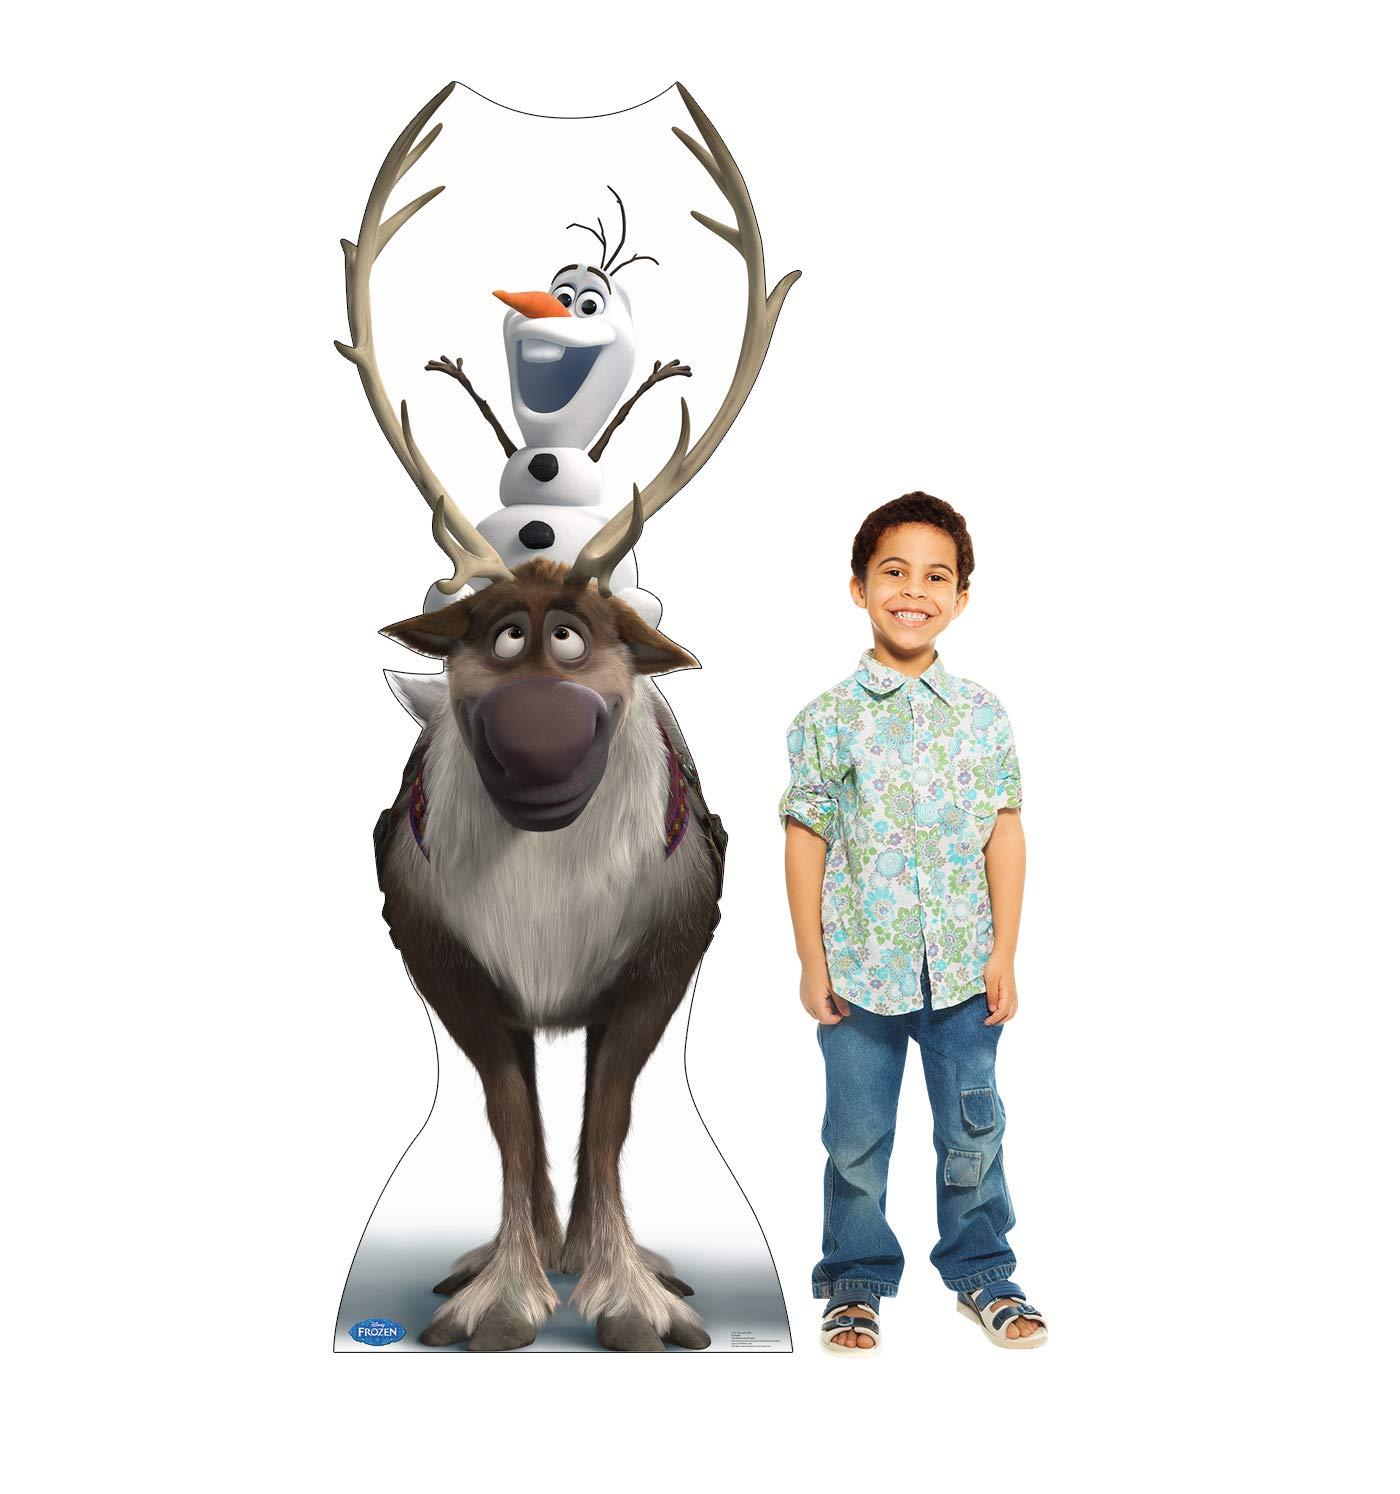 ed525f1ceb3b4 Amazon.com  Advanced Graphics Sven   Olaf Life Size Cardboard Cutout Standup  - Disney s Frozen (2013 Film)  Toys   Games